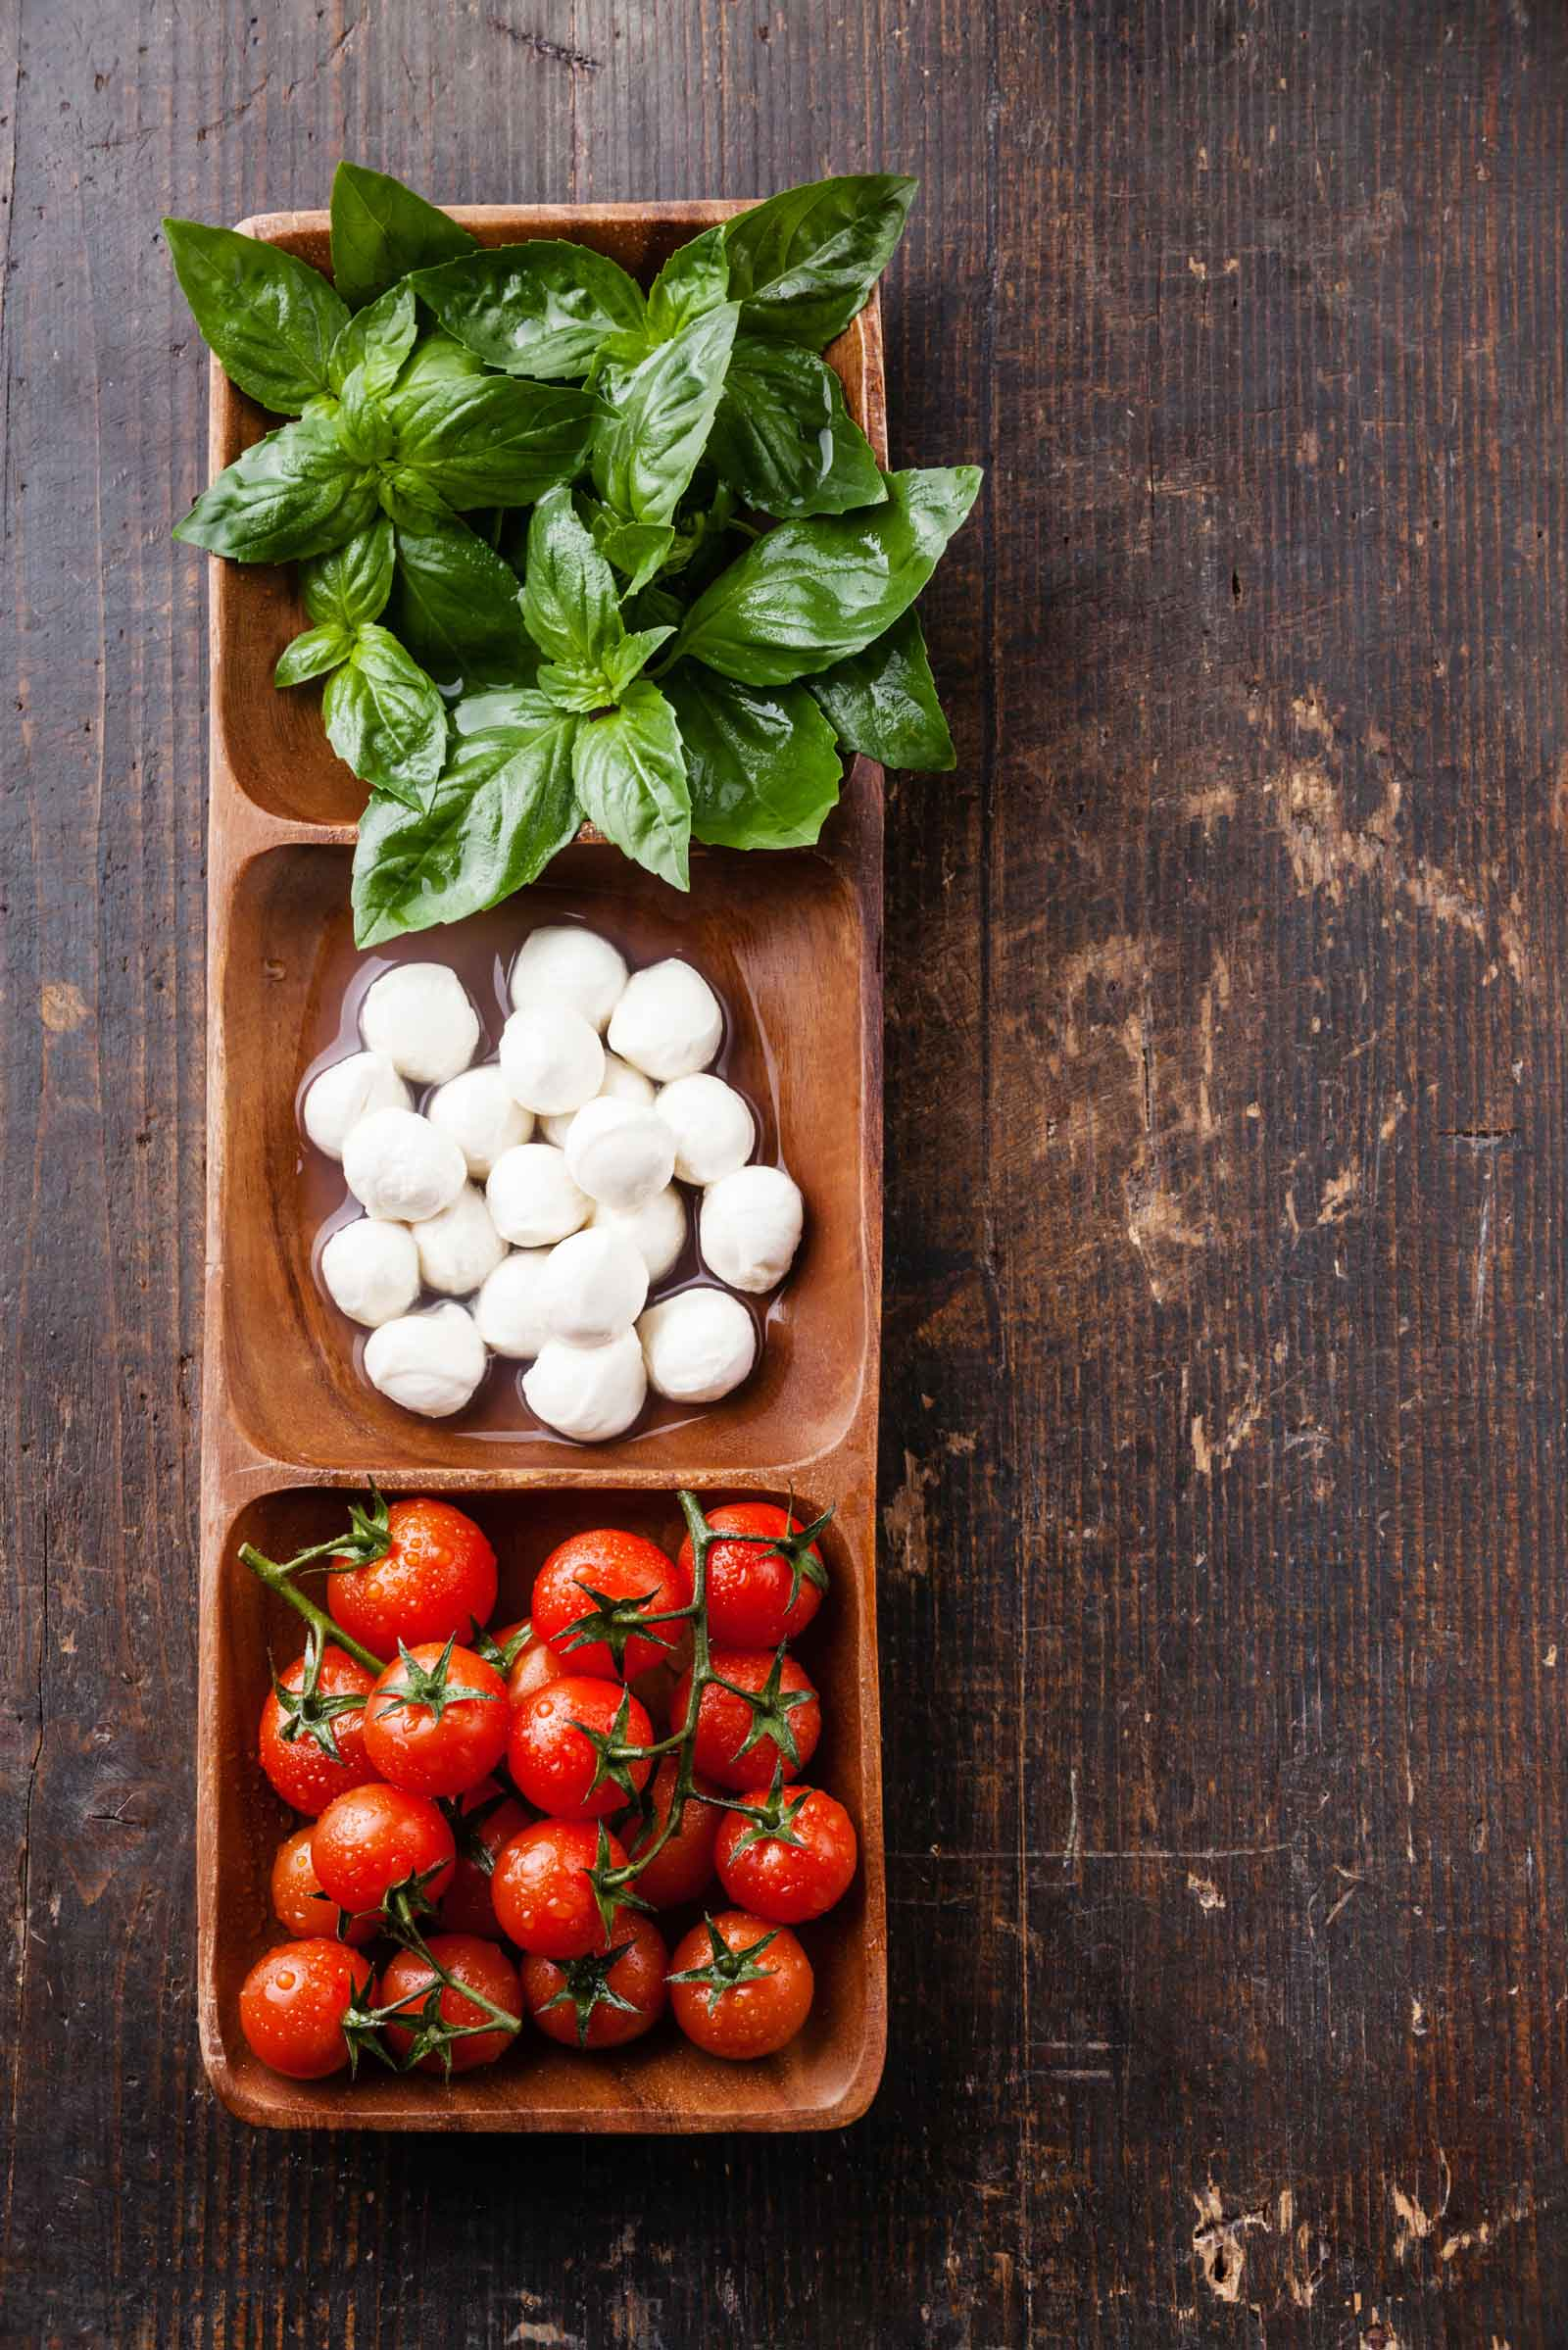 Classic tomato salsa with basil